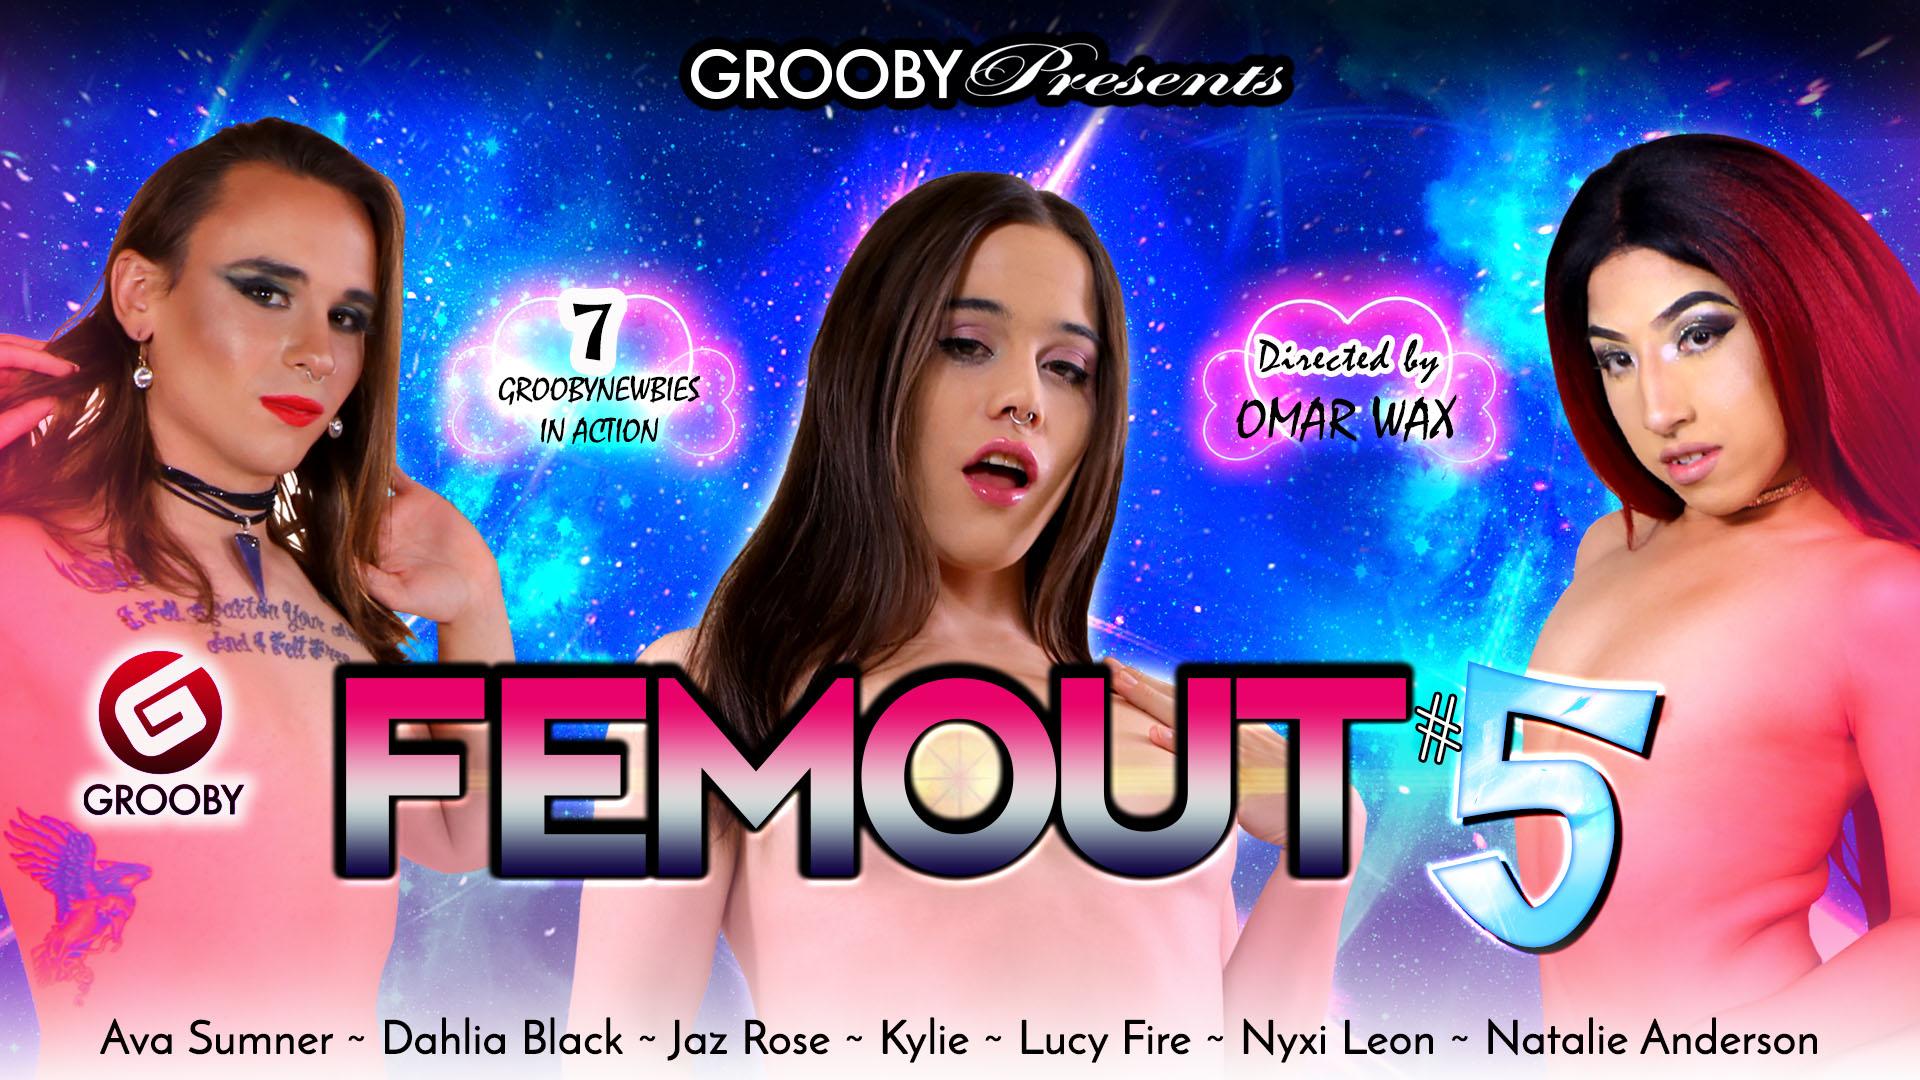 Femout #5 DVD -Trailer